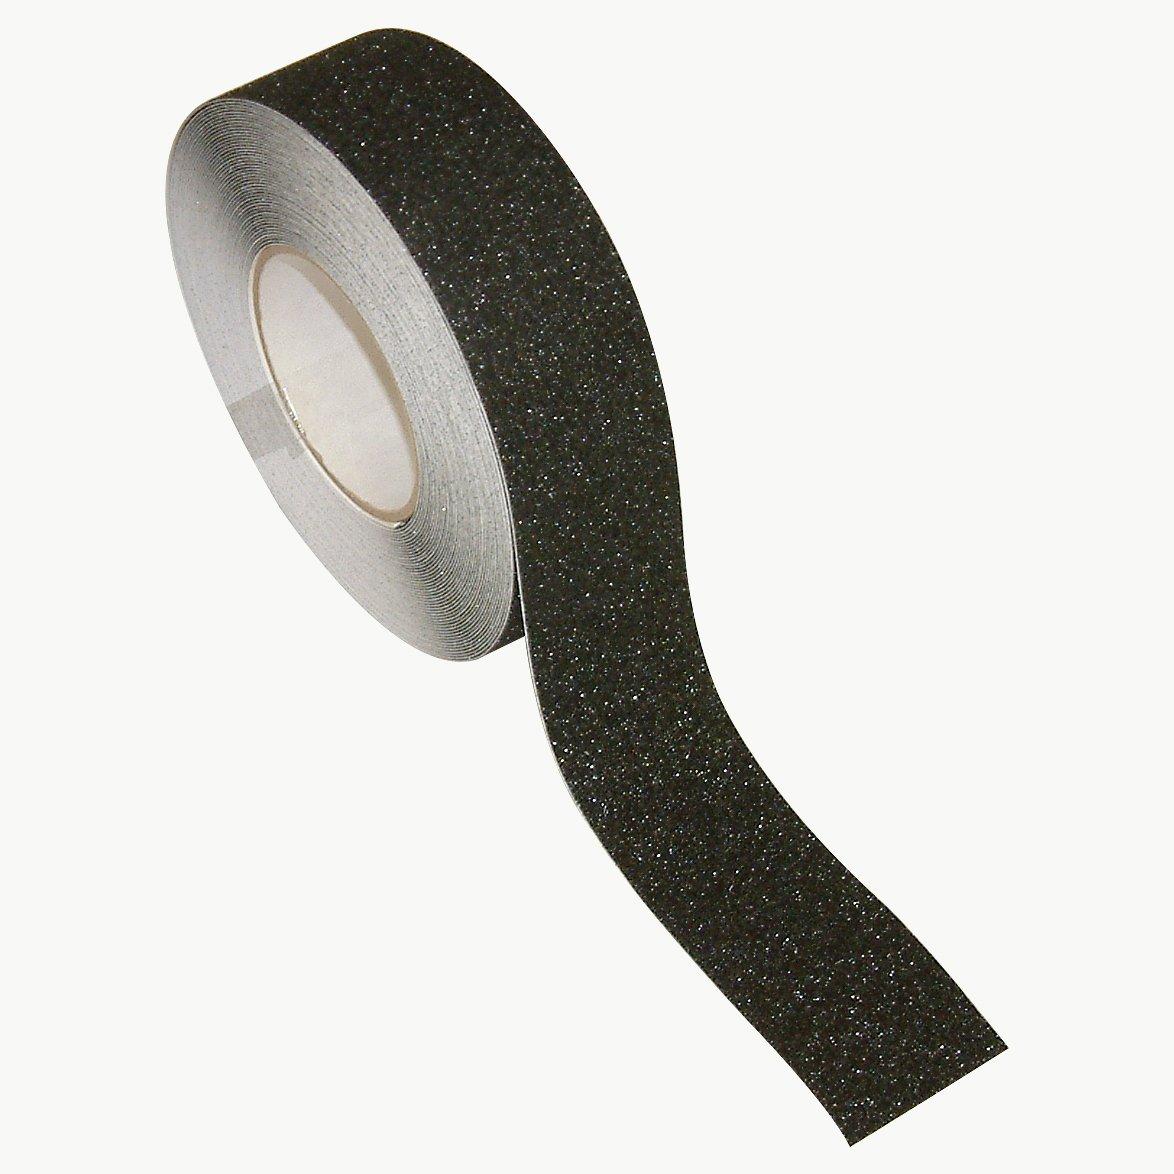 JVCC NS-2A Premium Non-Skid Tape: 2 in. x 60 ft. (Black)